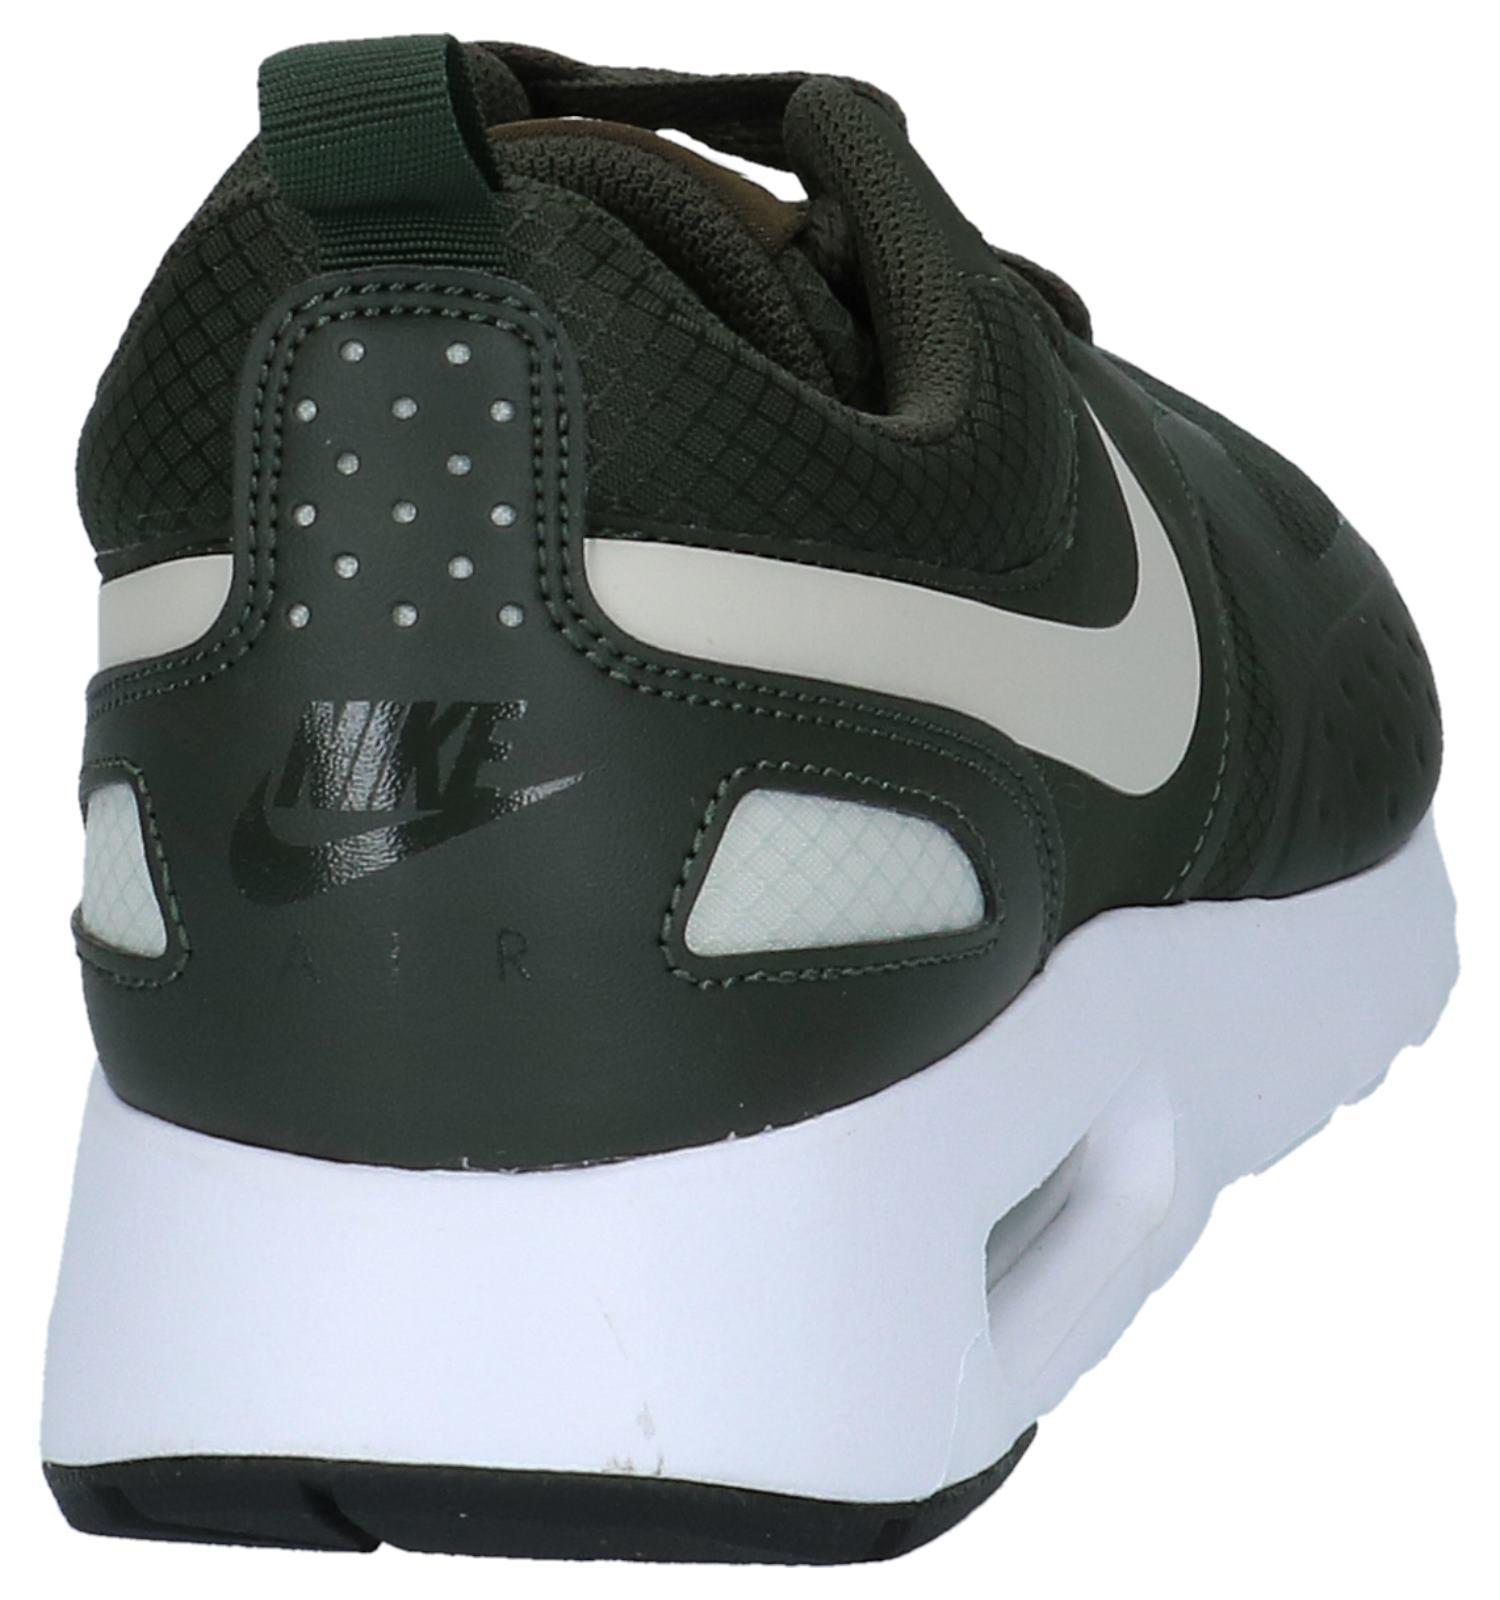 Vision Kaki Max Nike Air Sneakers mvNnw80